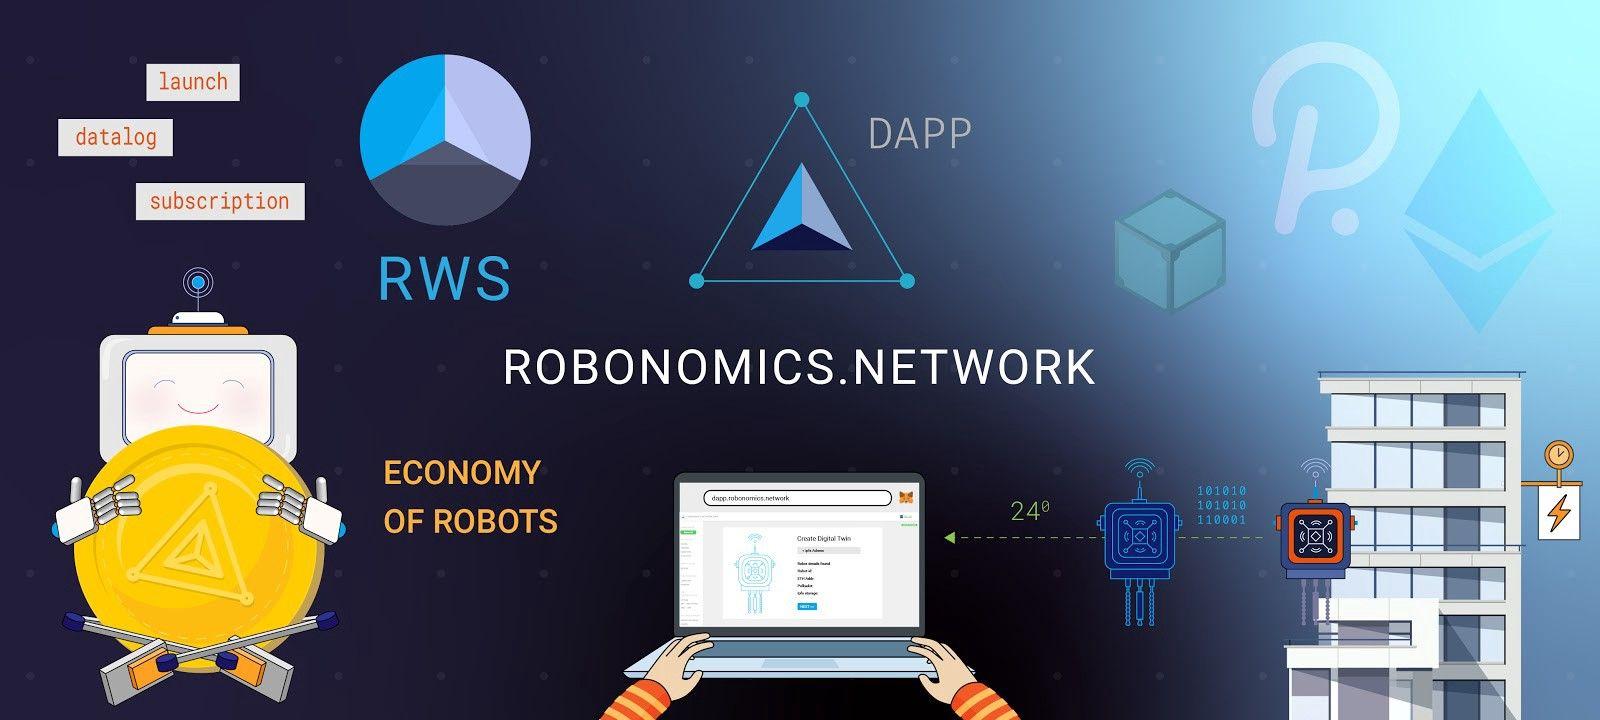 The ultimate guide to Robonomics, RWS and Robonomics parachain on Polkadot / Robonomics Network